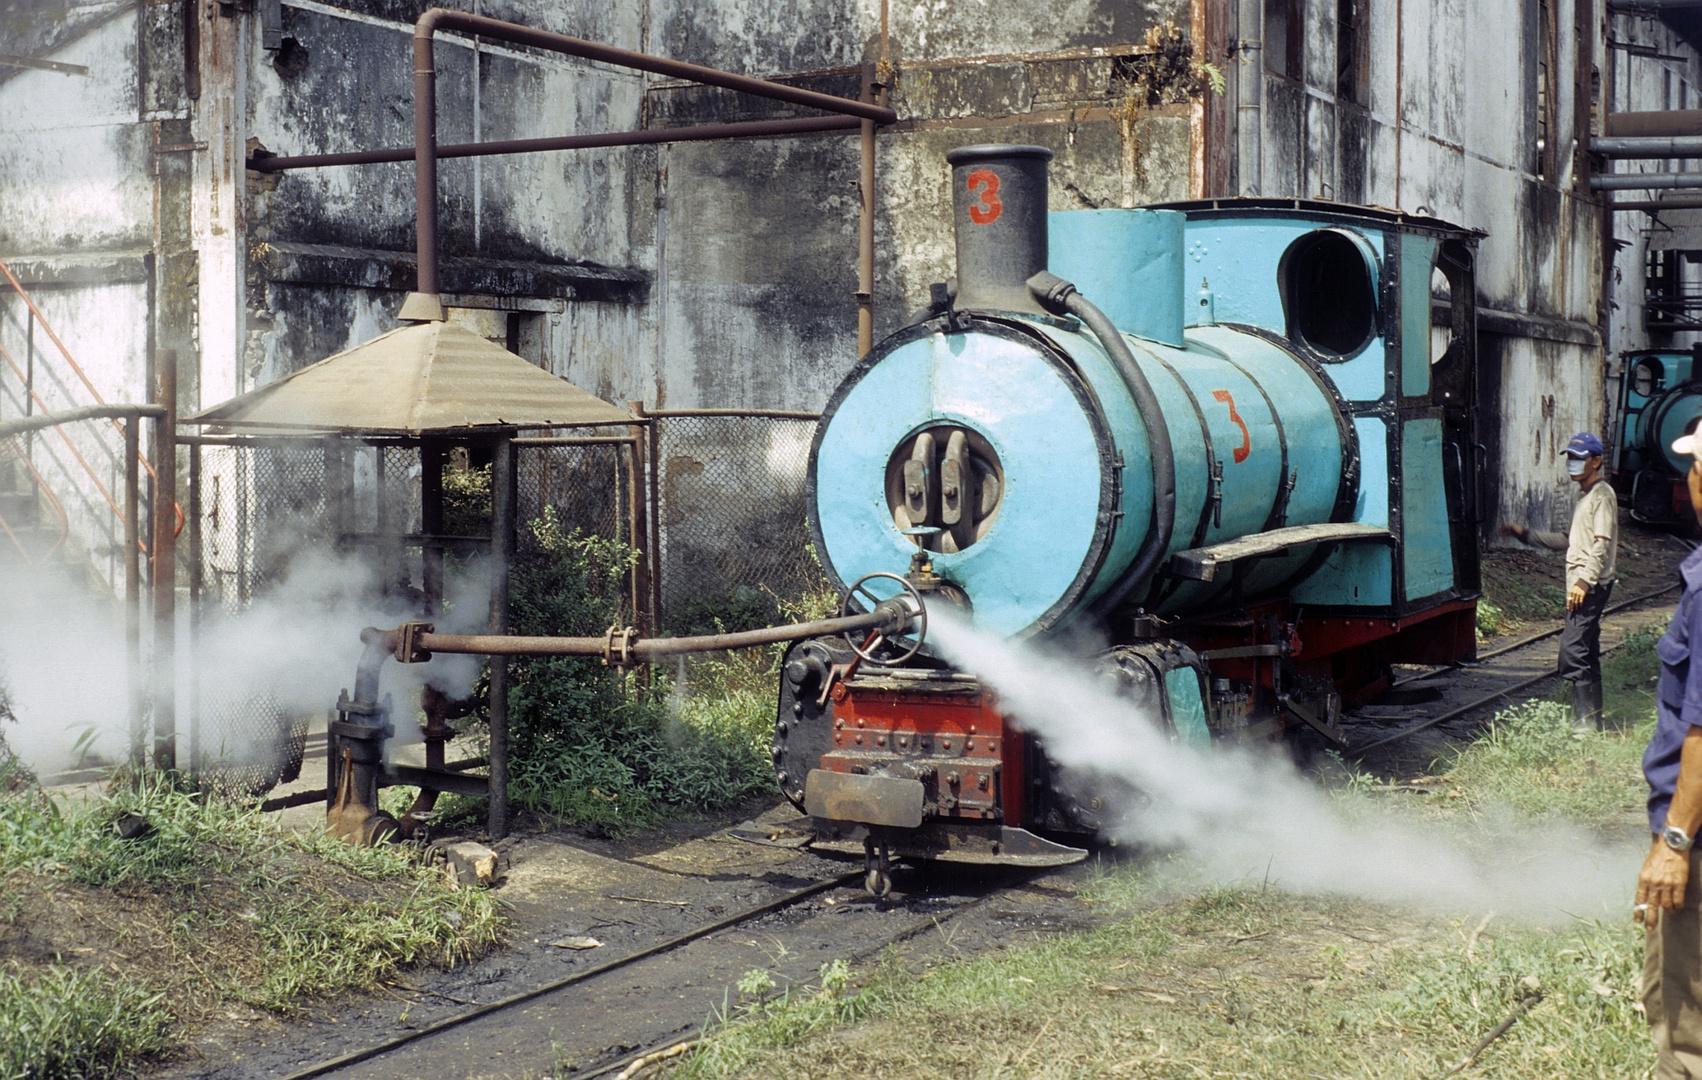 Zuckerfabrik PG Semboro, Jember (Java, Indonesien), Juli 2003